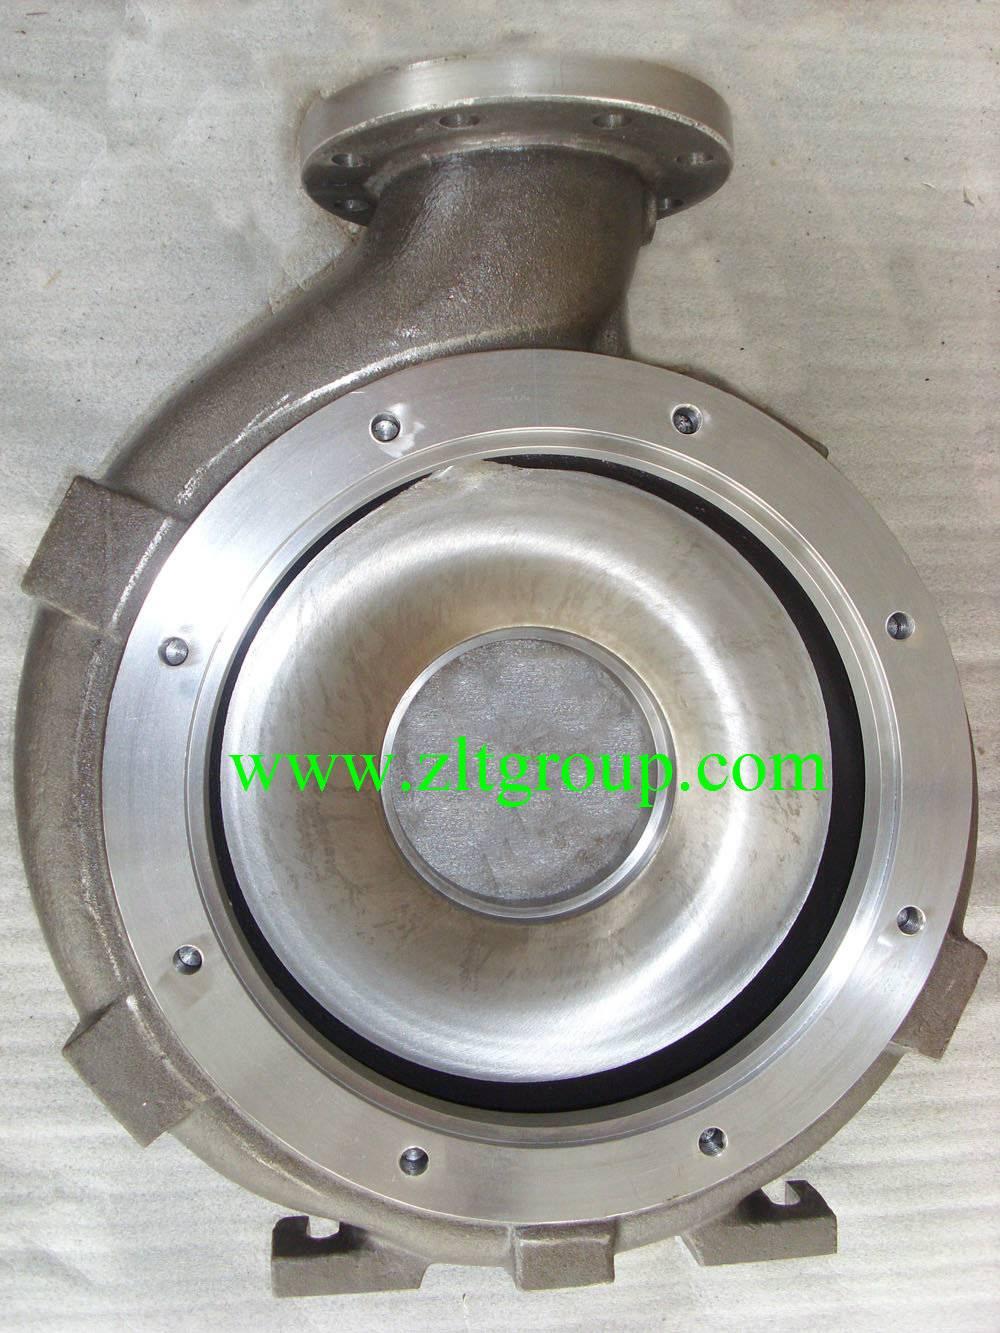 ANSI Durco pump casing